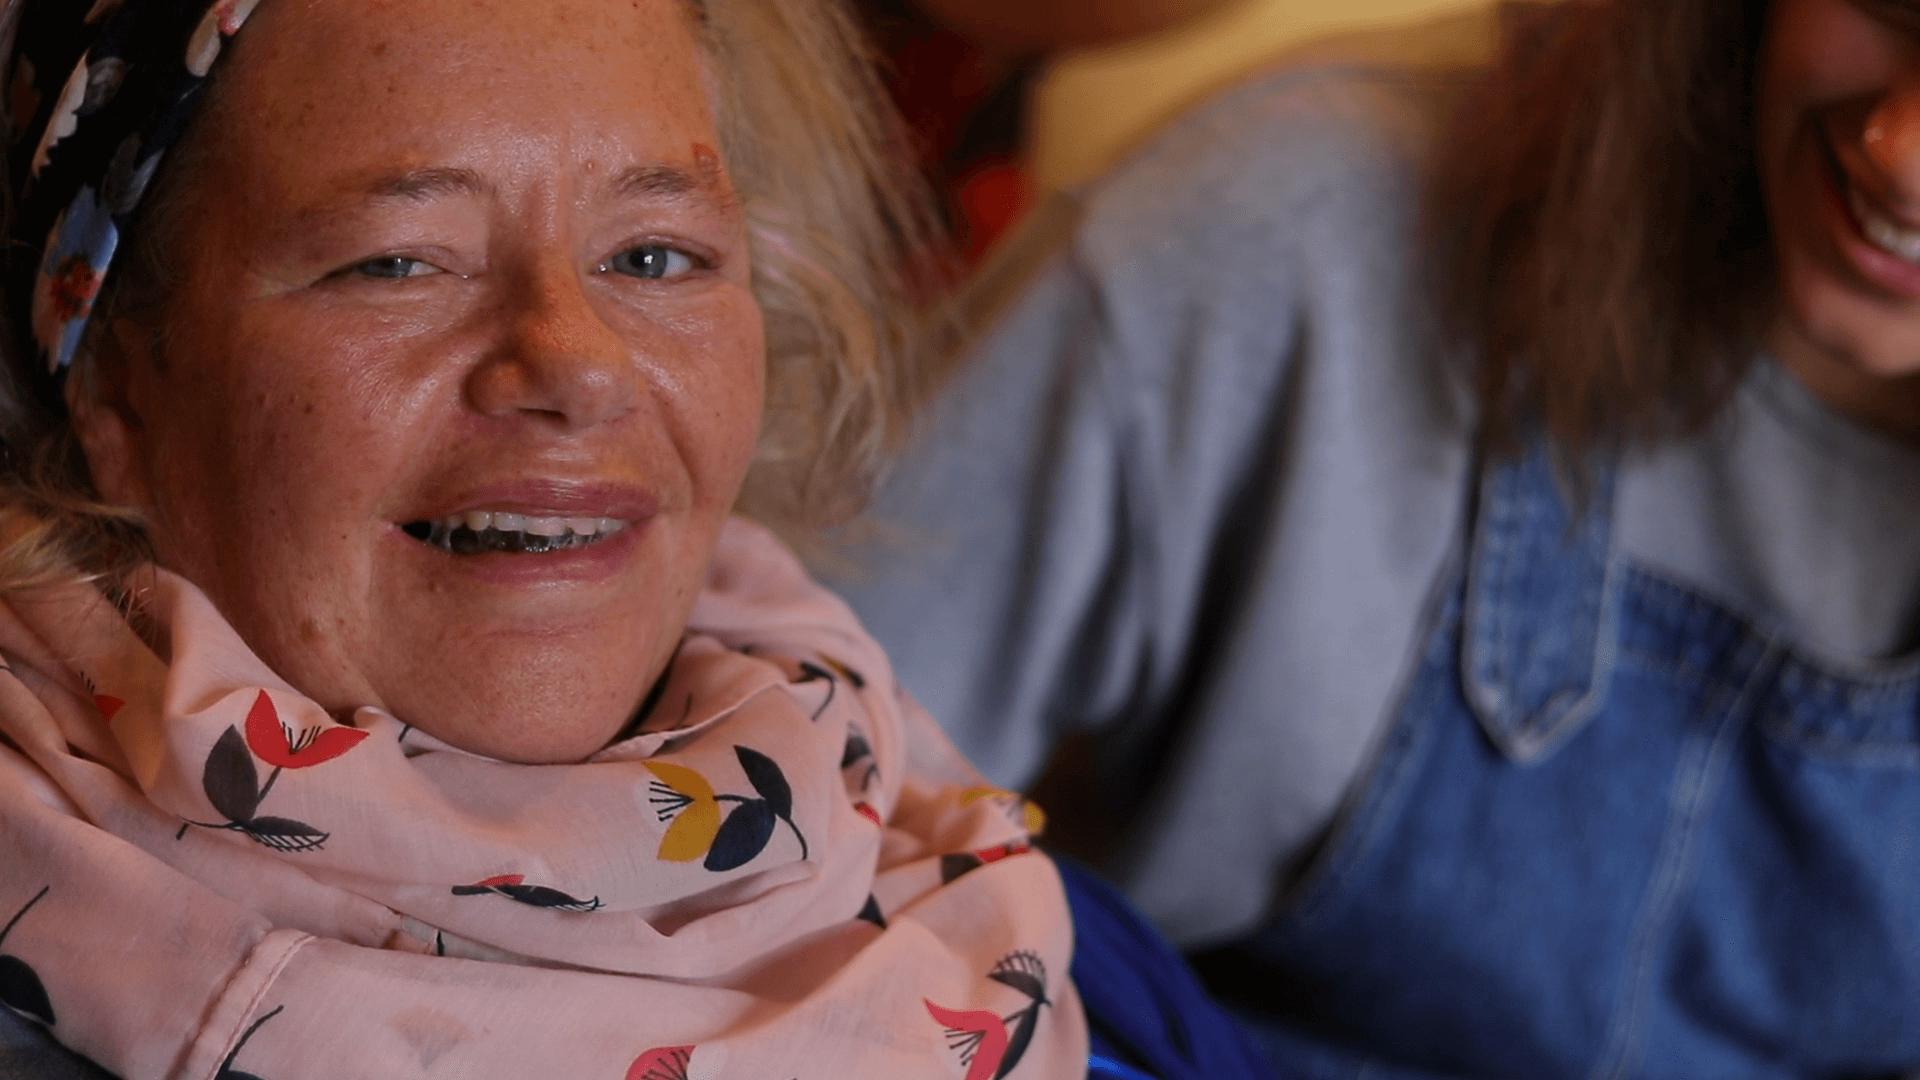 Jess mum Clare smiling